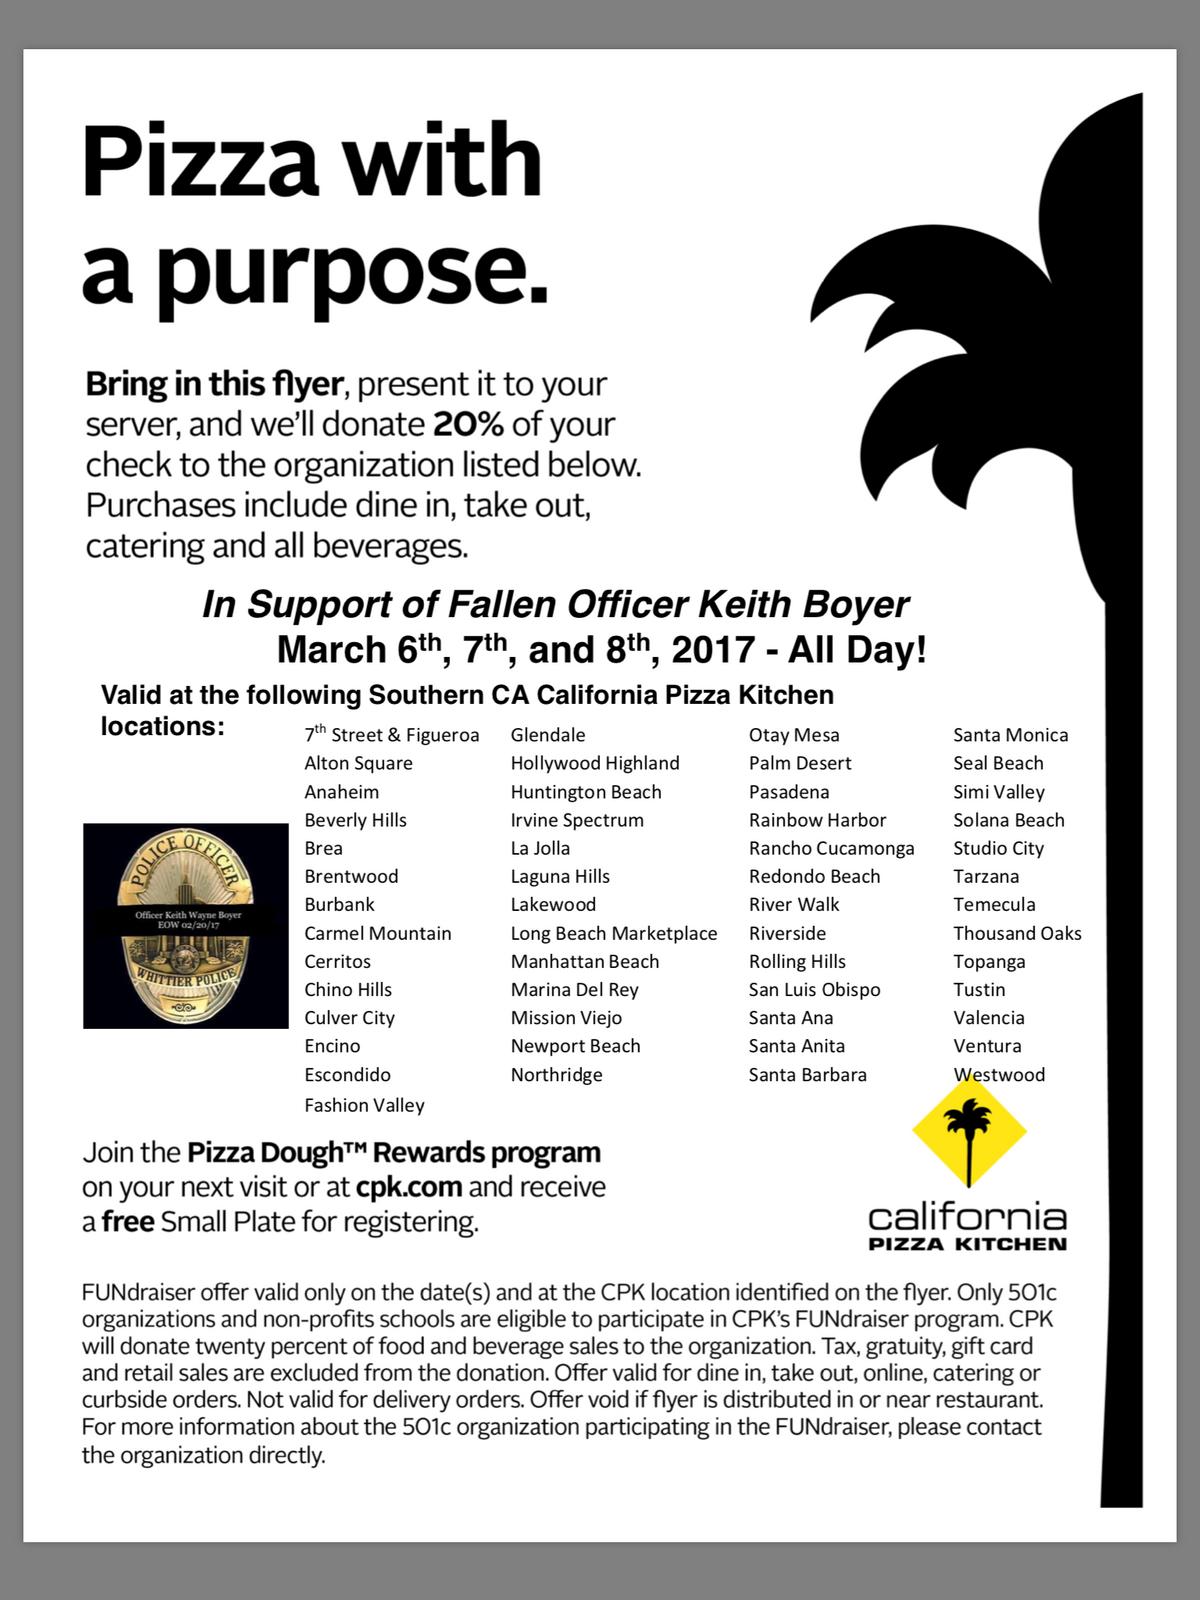 fundraiser for fallen officer keith boyer monday through wednesday